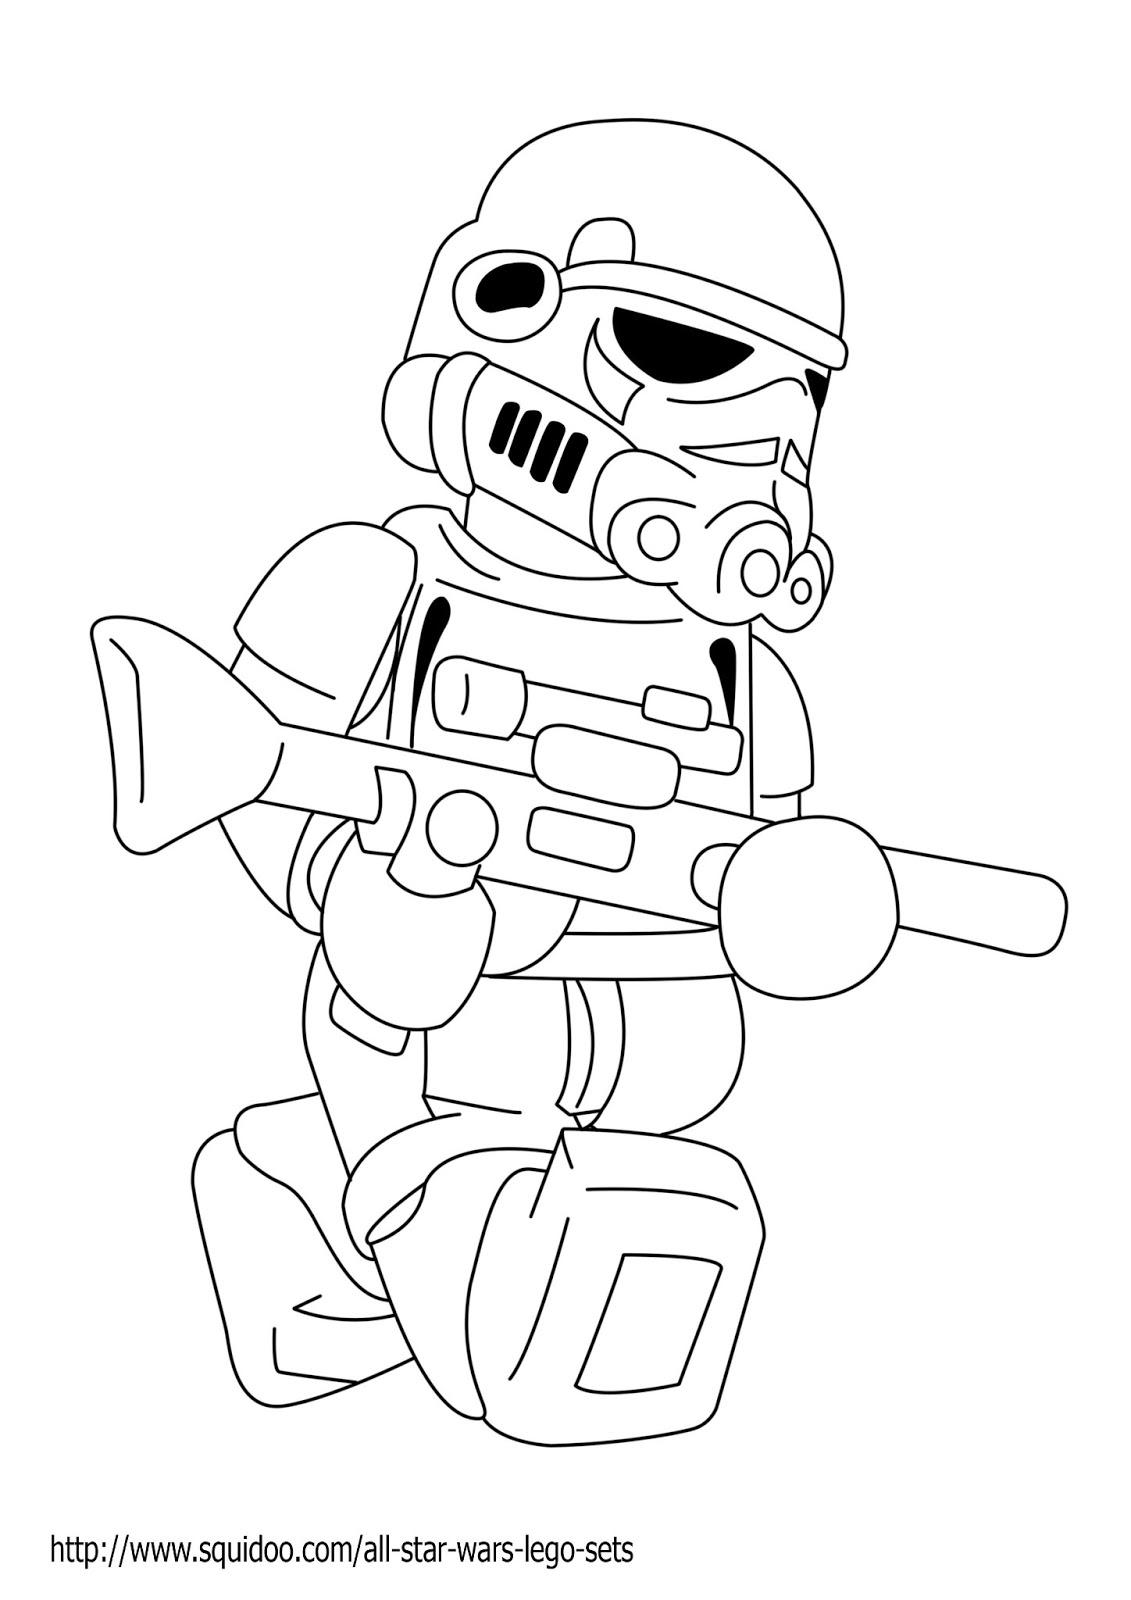 Lego Star Wars Darth Vader Coloring Pages At Getdrawings Free